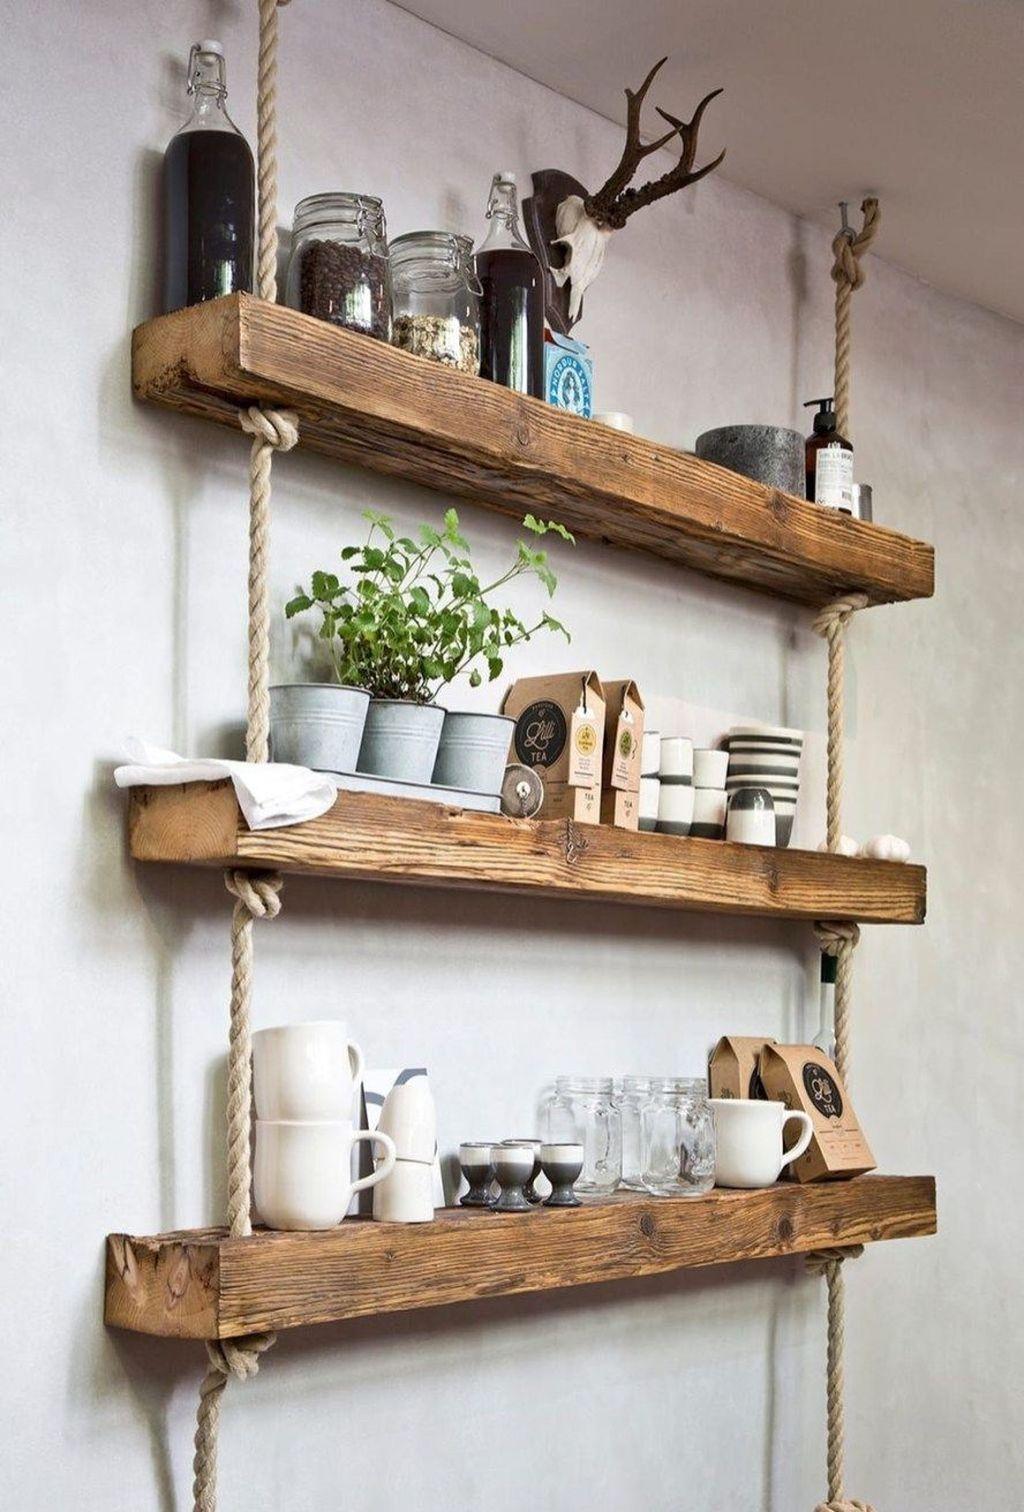 46 Inspiring Rustic Home Decor Living Room Ideas – HOOMDSGN